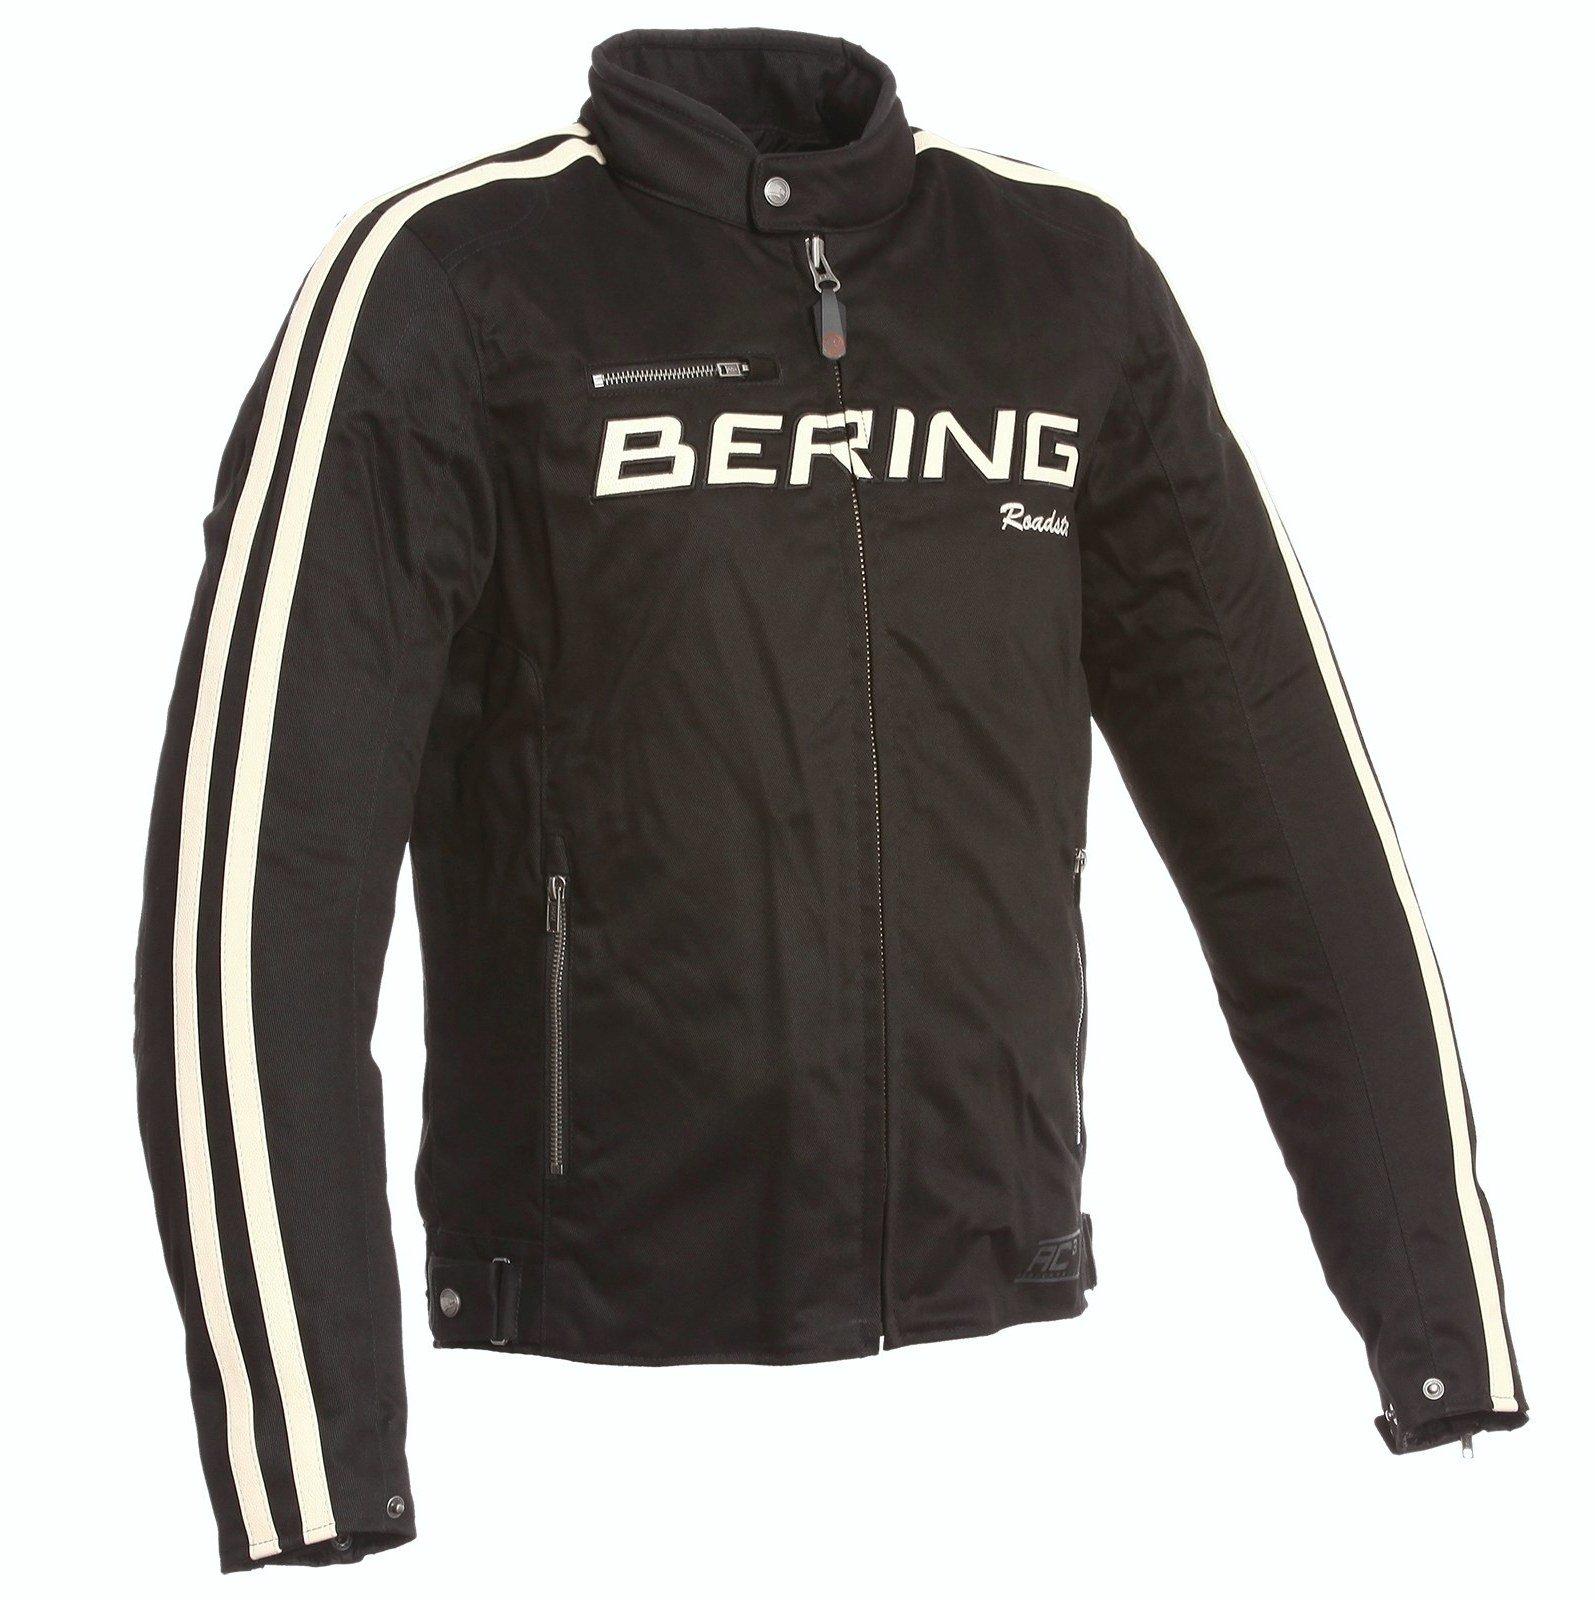 Bering scalp beep bike antes